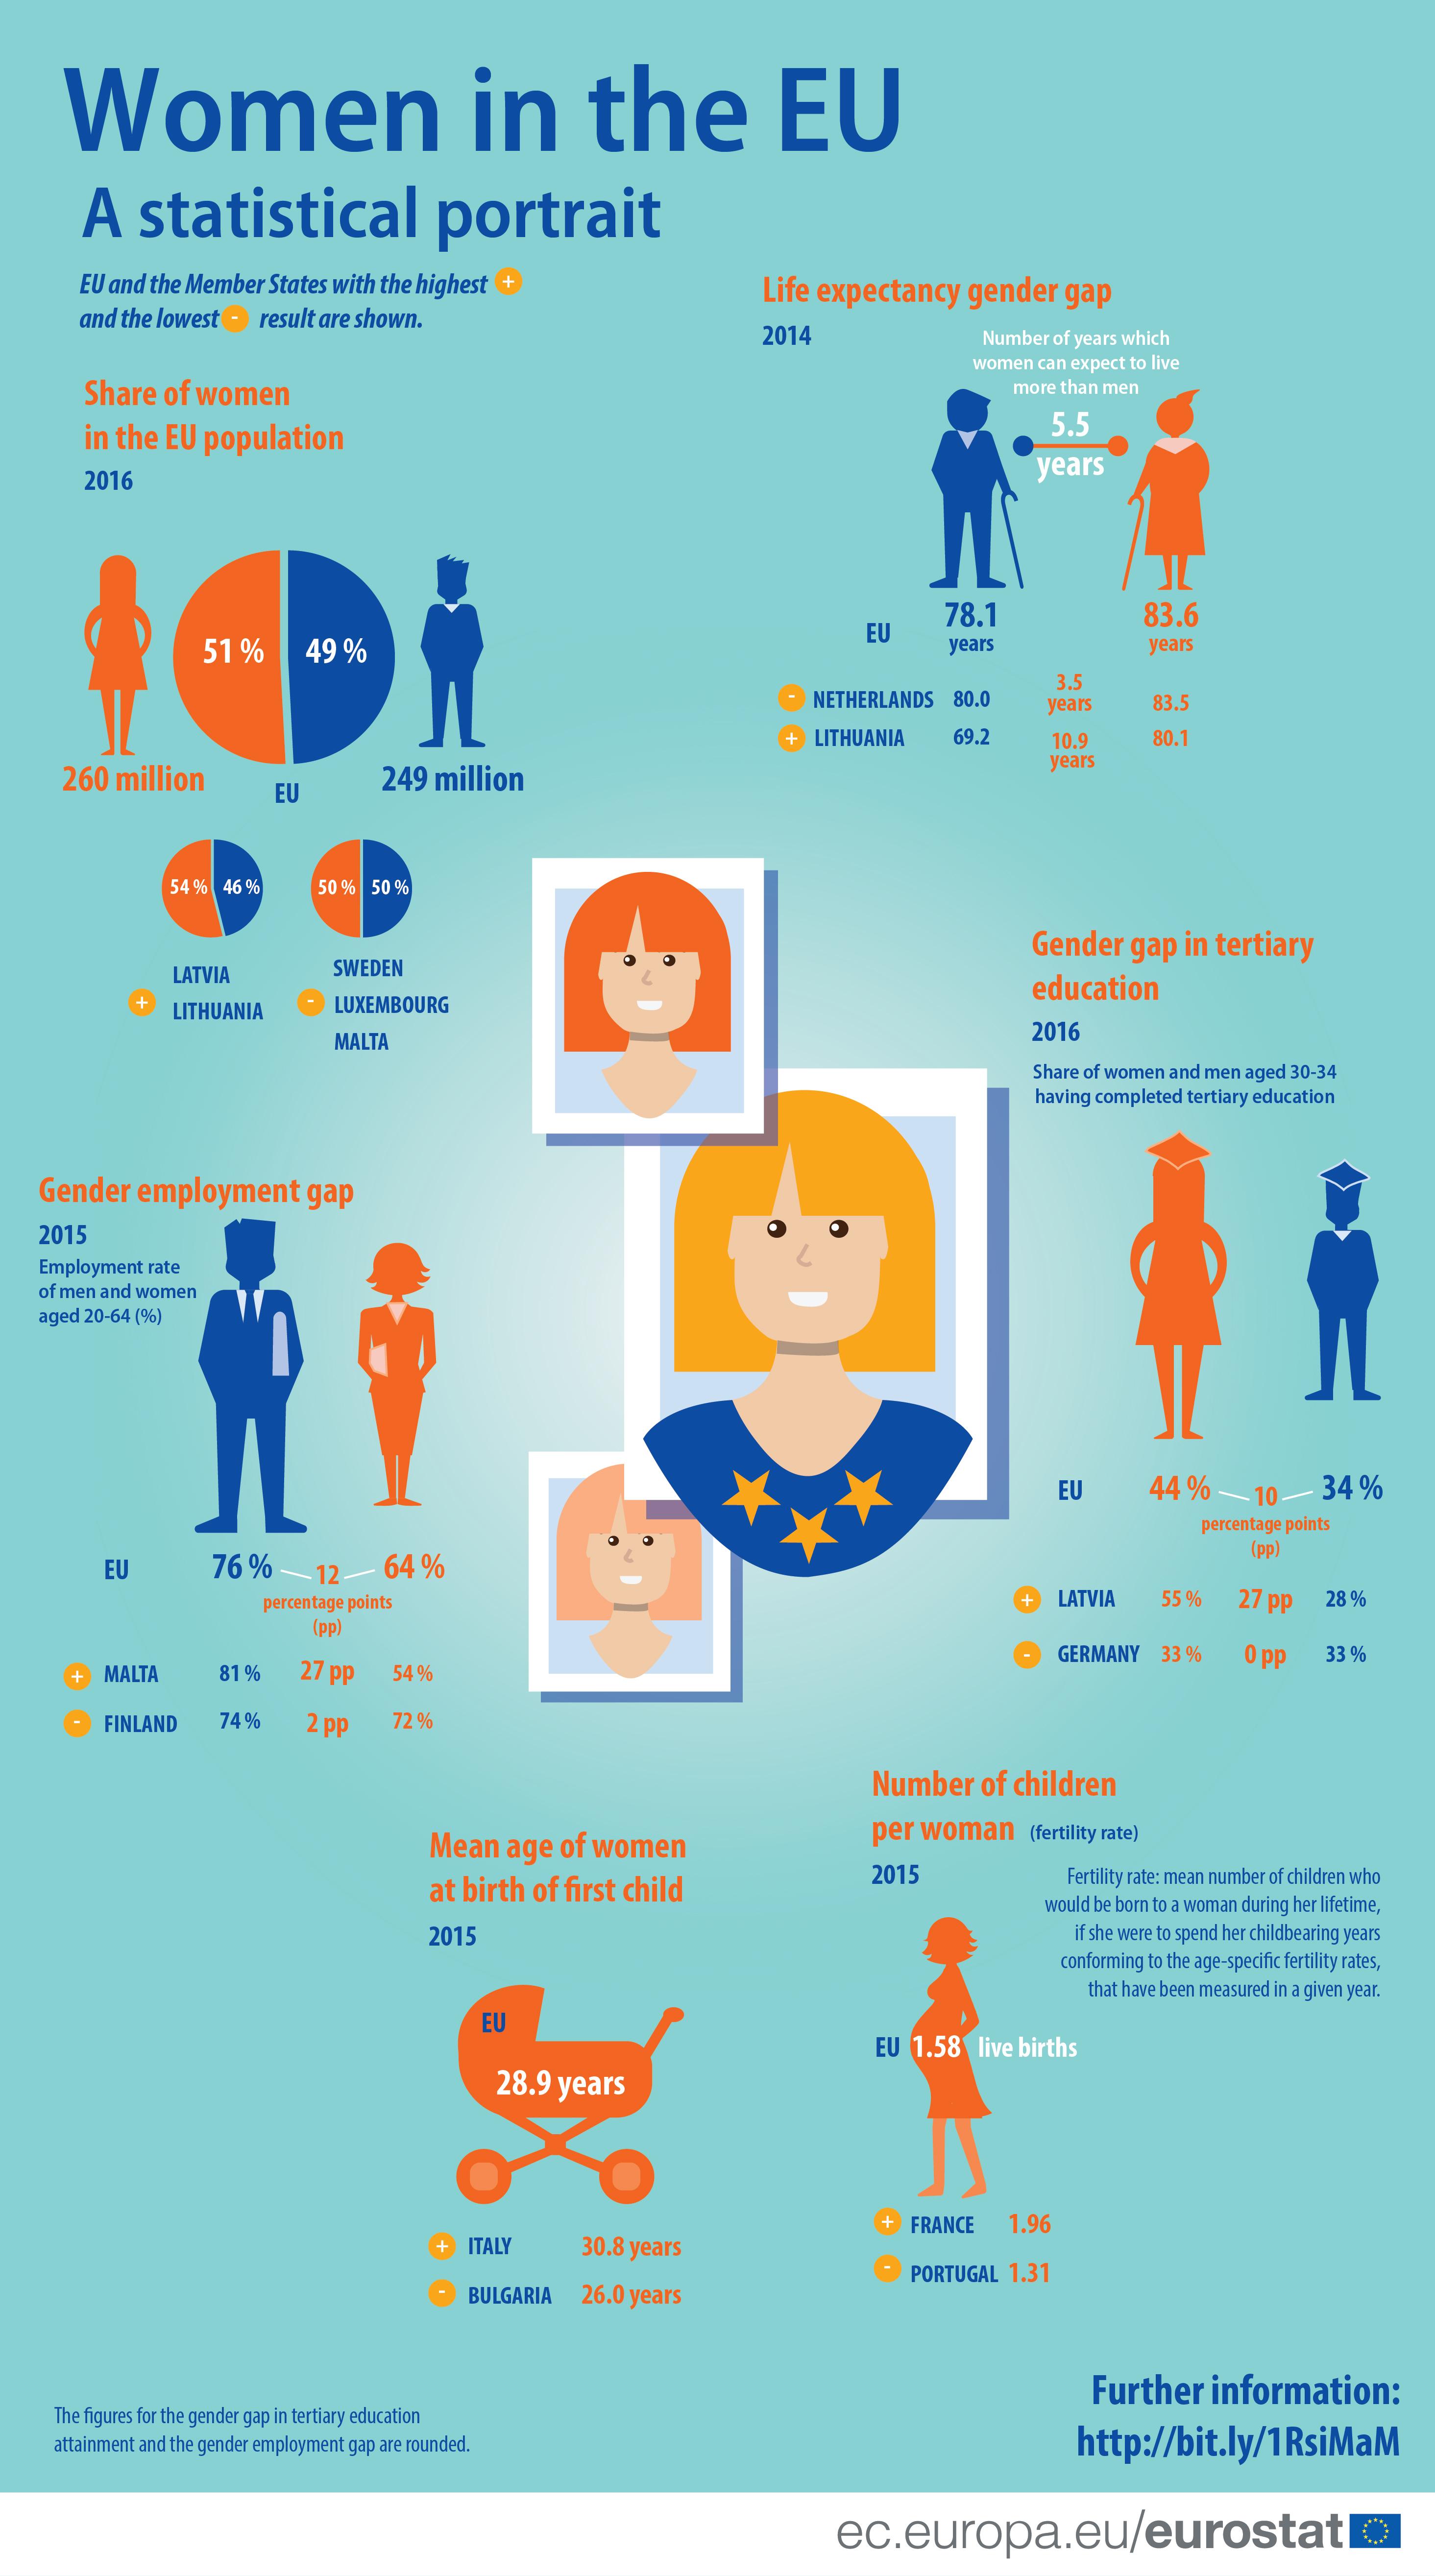 Graphic: Women in the EU